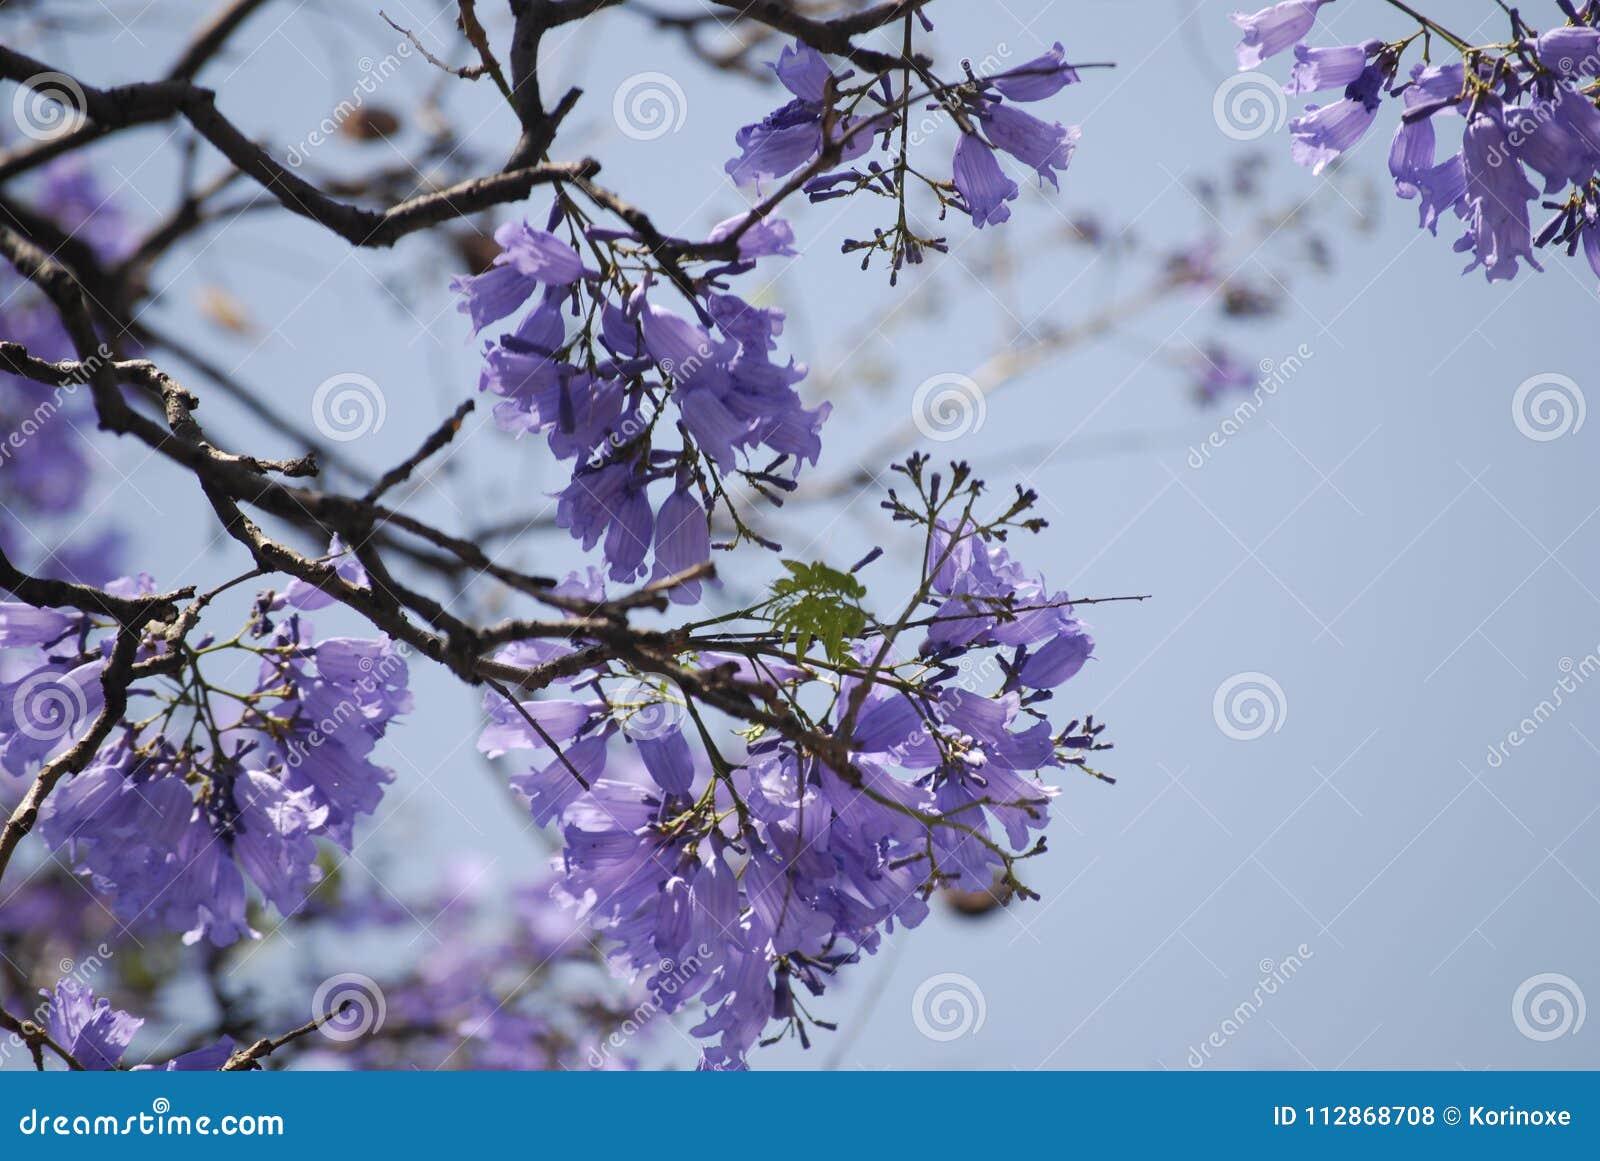 Jacaranda Tree Flowers With Purple Flowers Stock Photo Image Of Mexico Floral